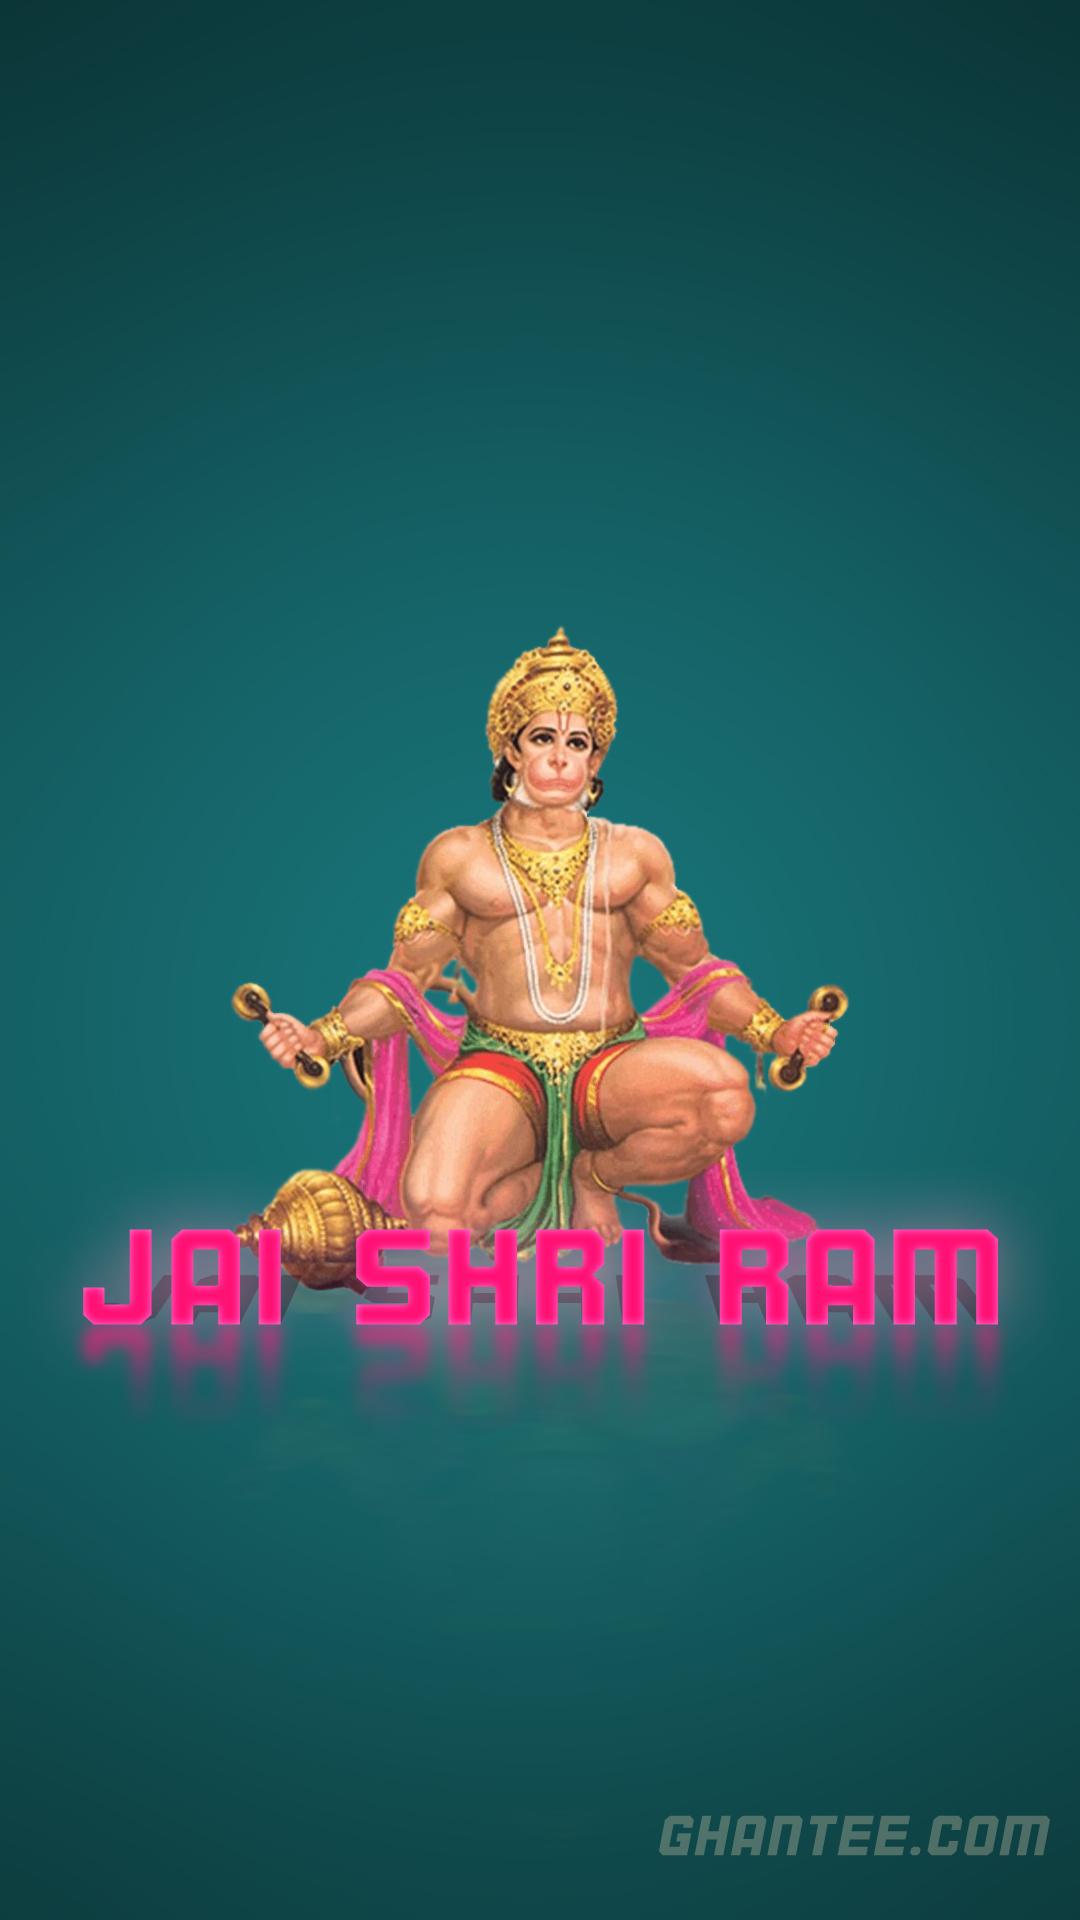 veer Hanuman plain phone wallpaper | full HD